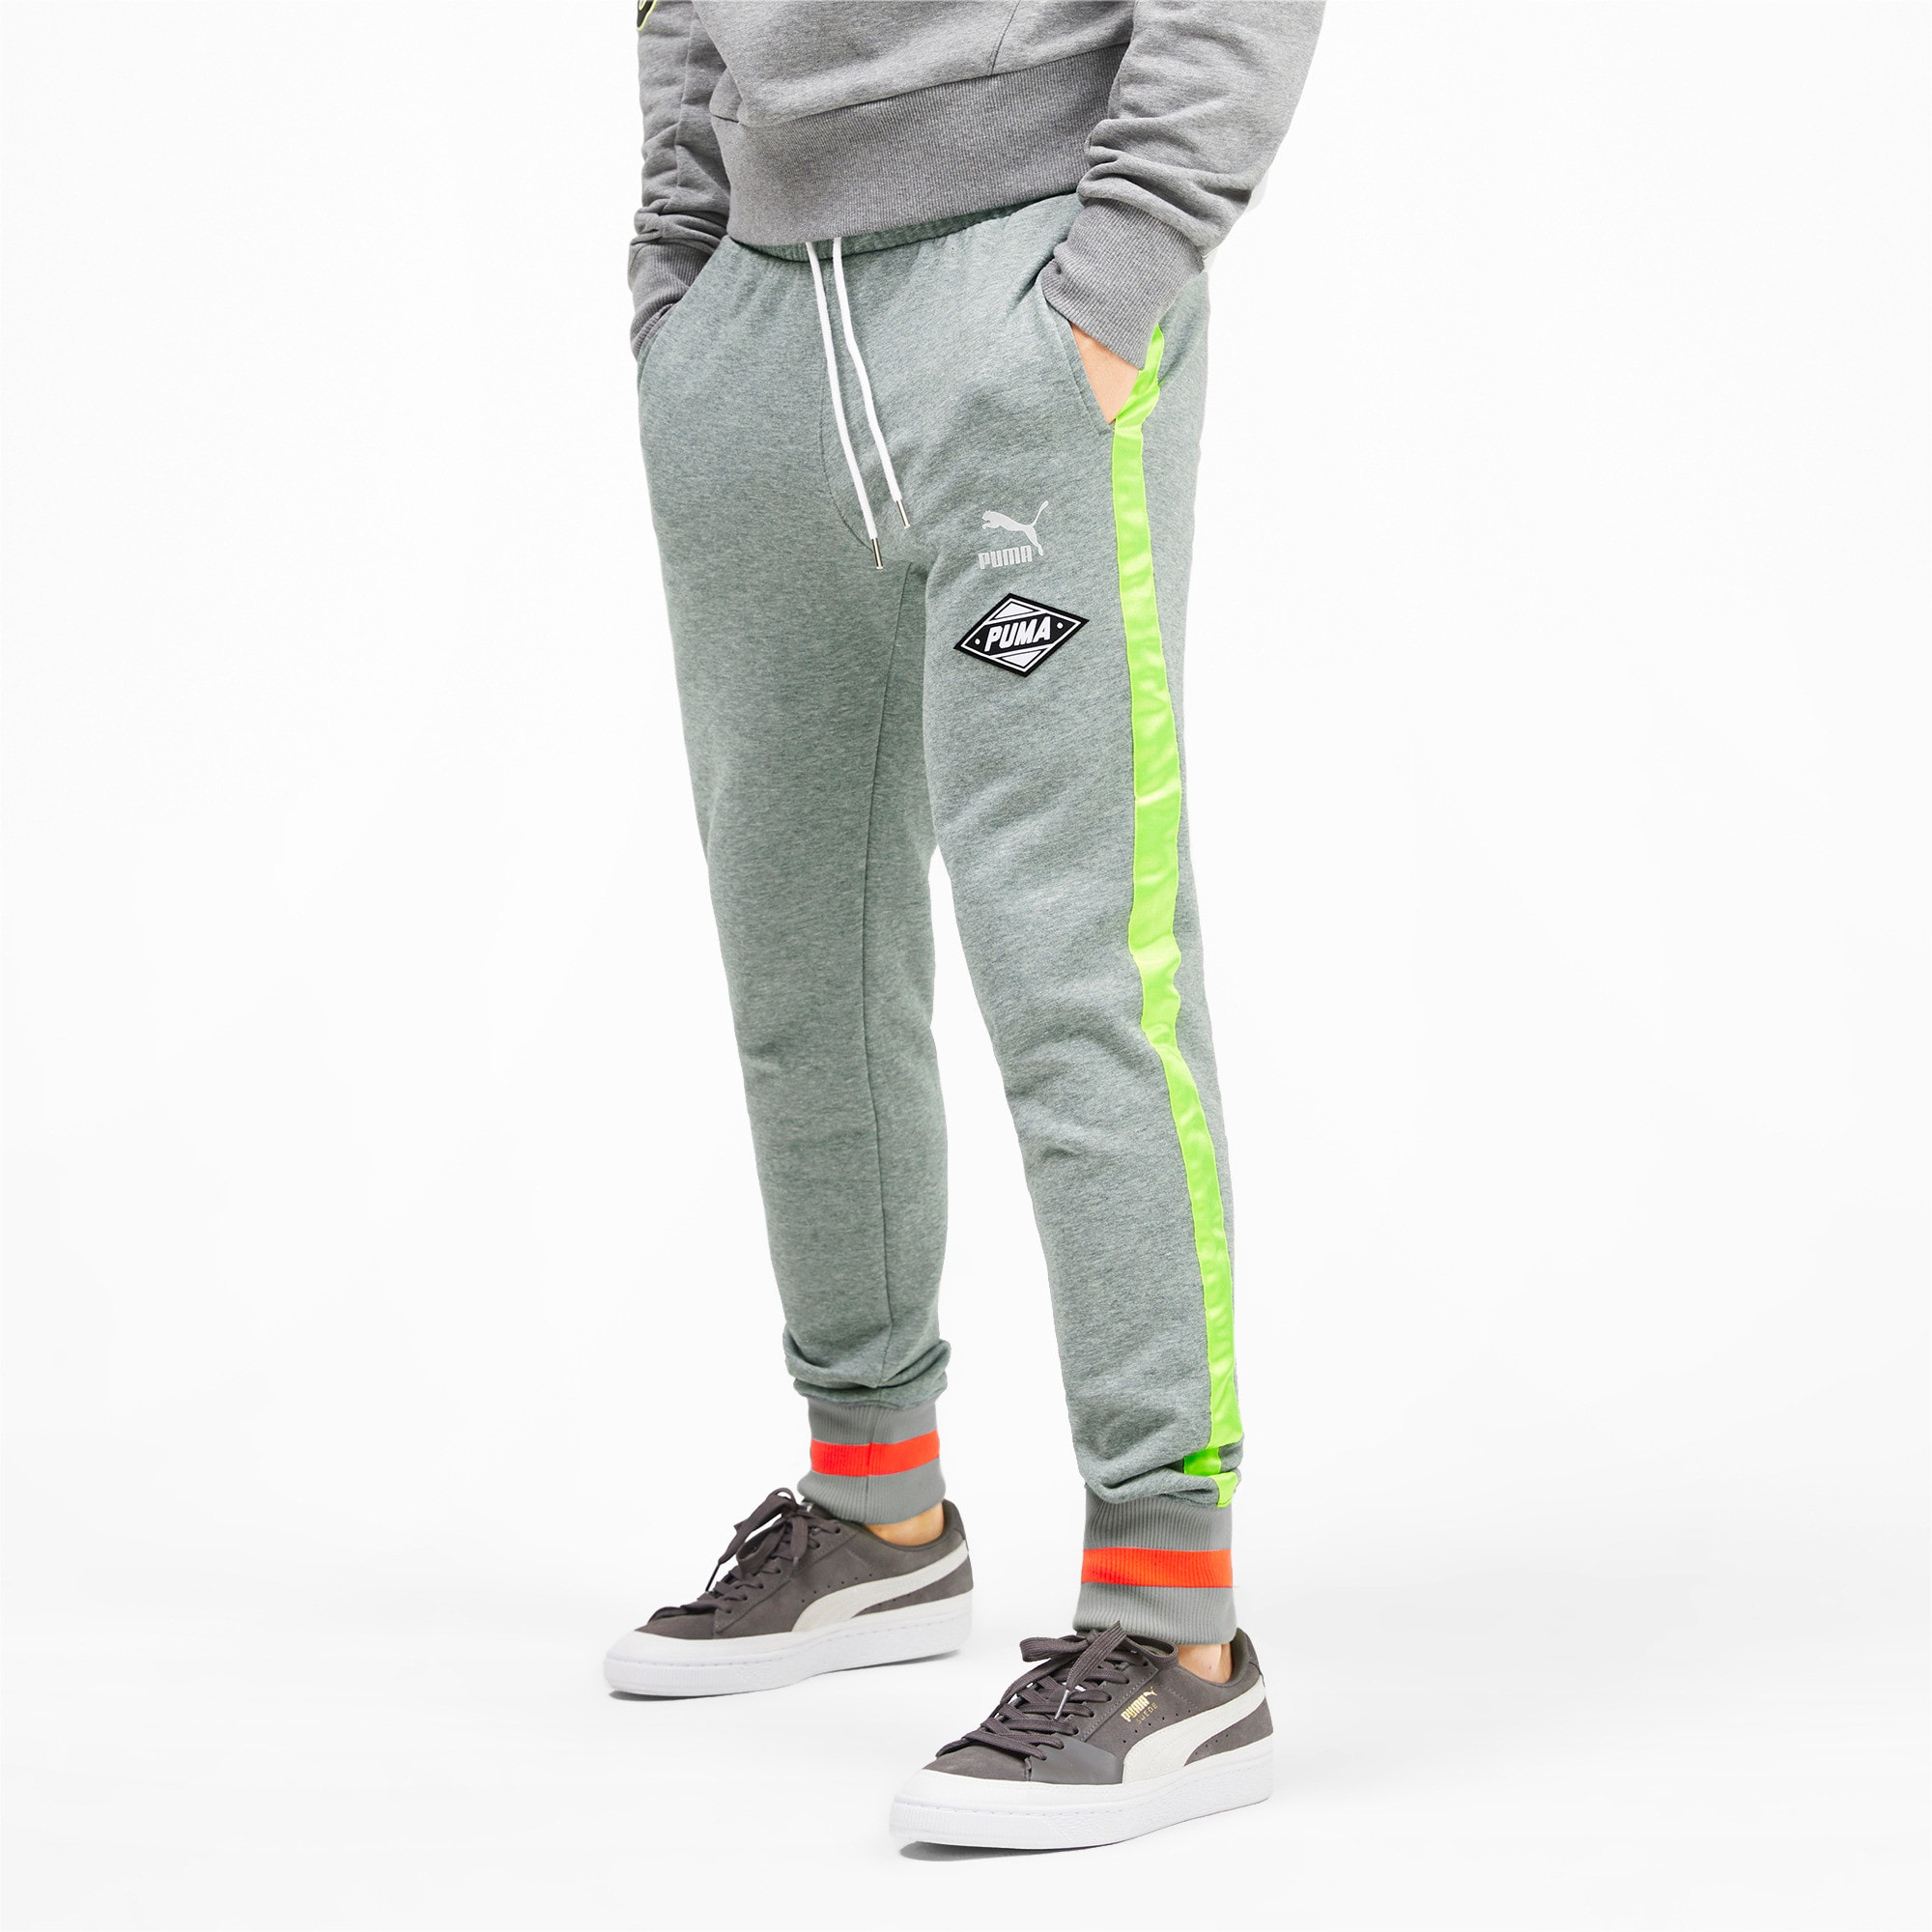 Thumbnail 2 of luXTG Men's Cuffed Sweatpants, Medium Gray Heather, medium